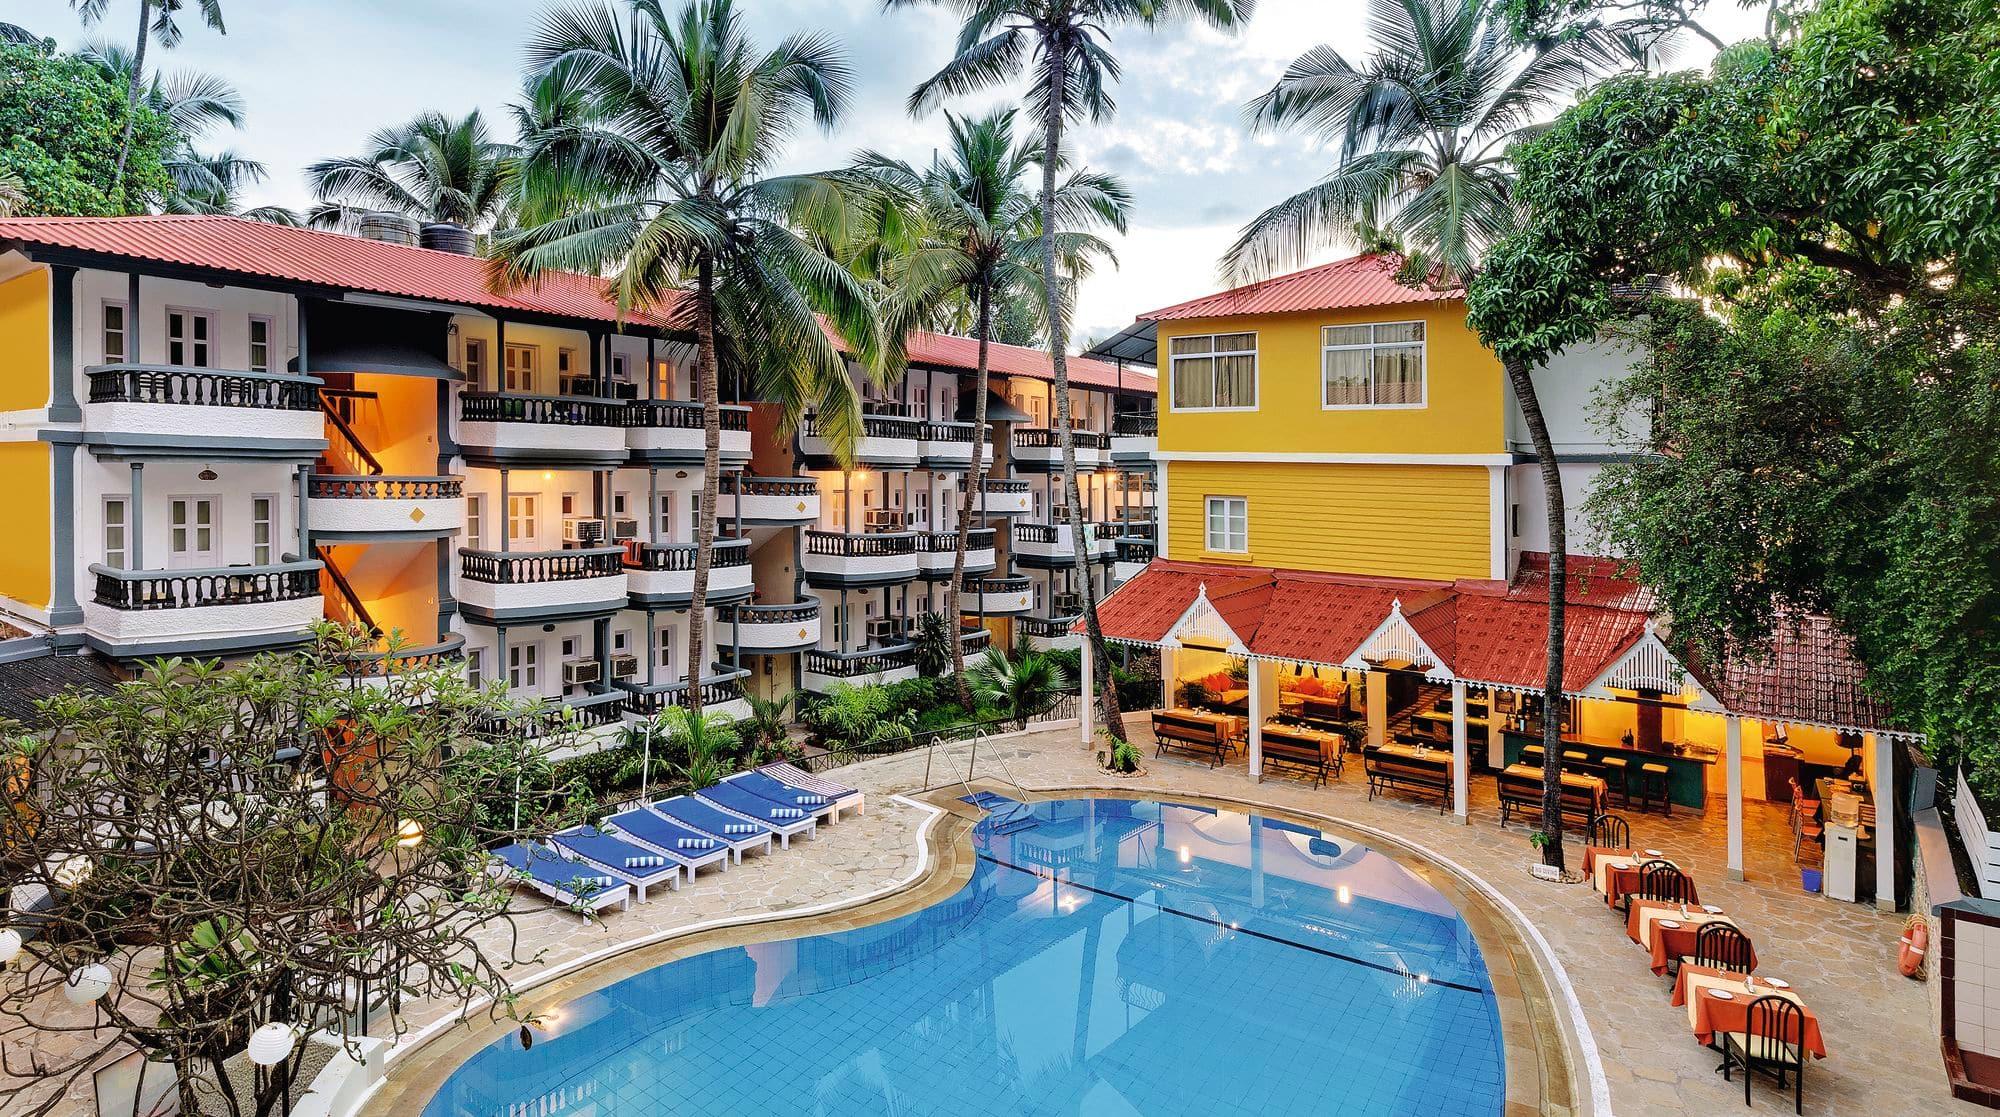 Hotel 3 Santiago Resort, India, Goa: description, rooms and reviews 67